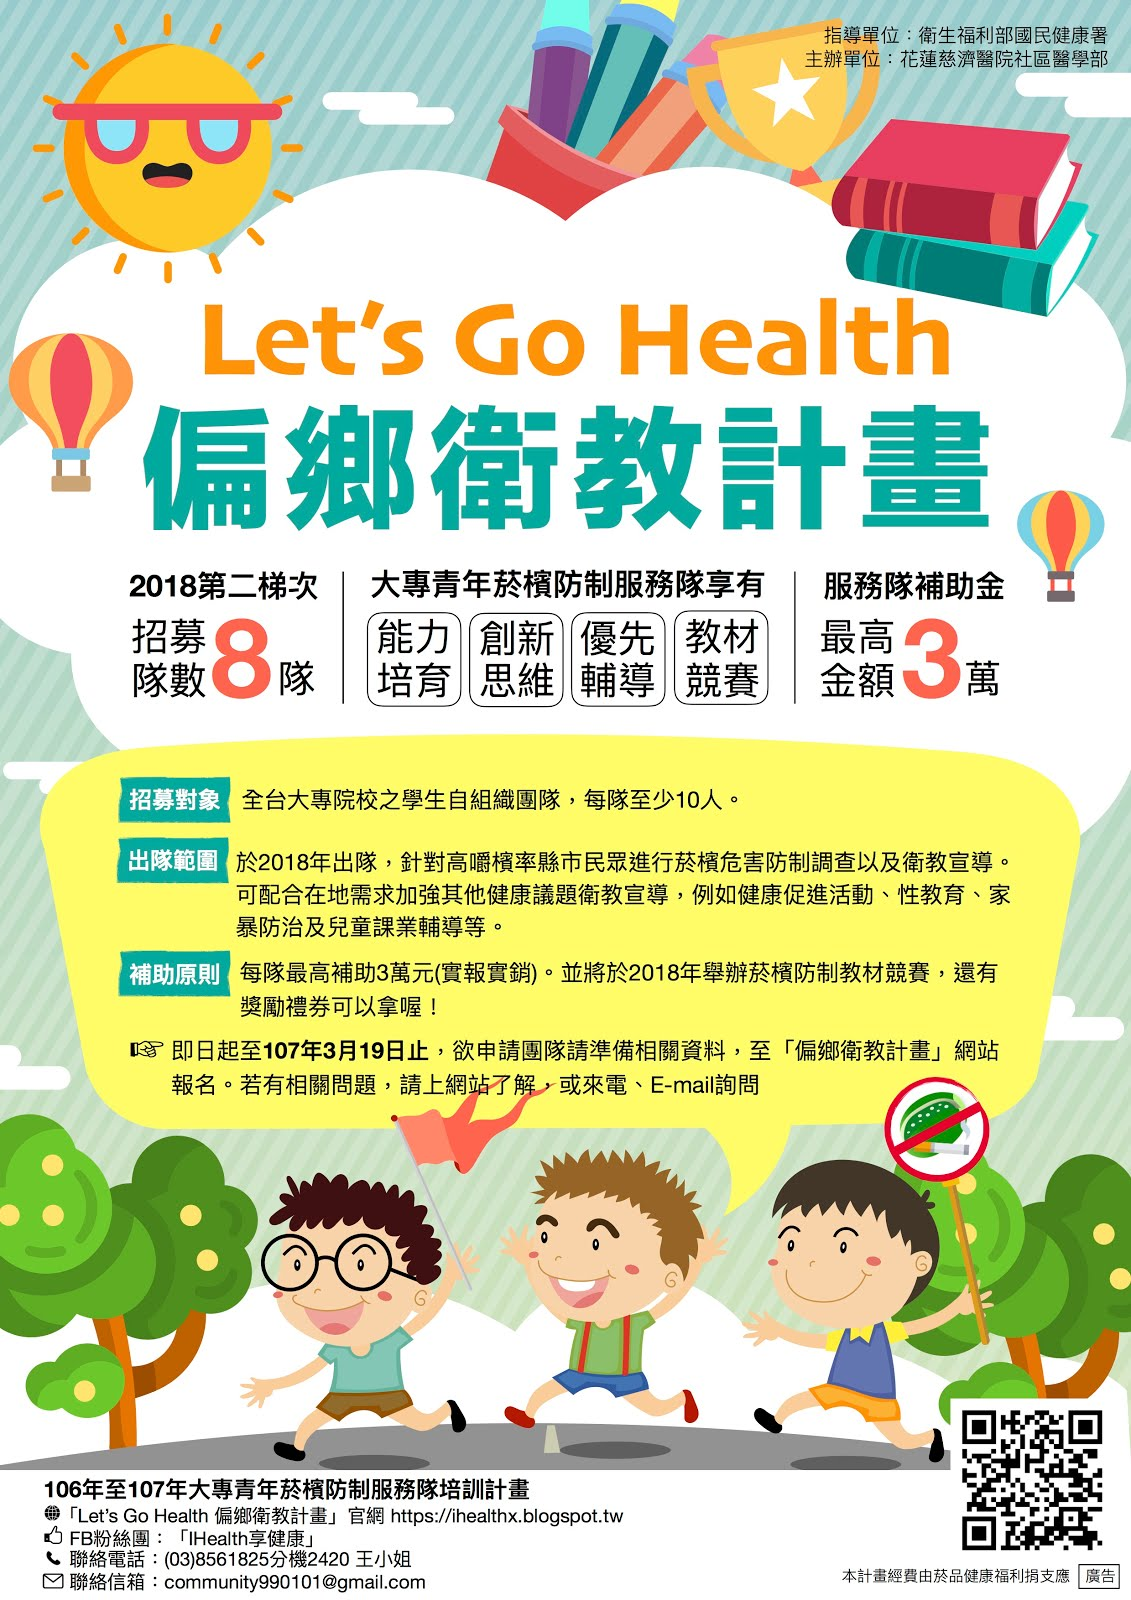 2018年第二梯次!Let's Go Health!偏鄉衛教計畫開始報名囉~(報名已截止)